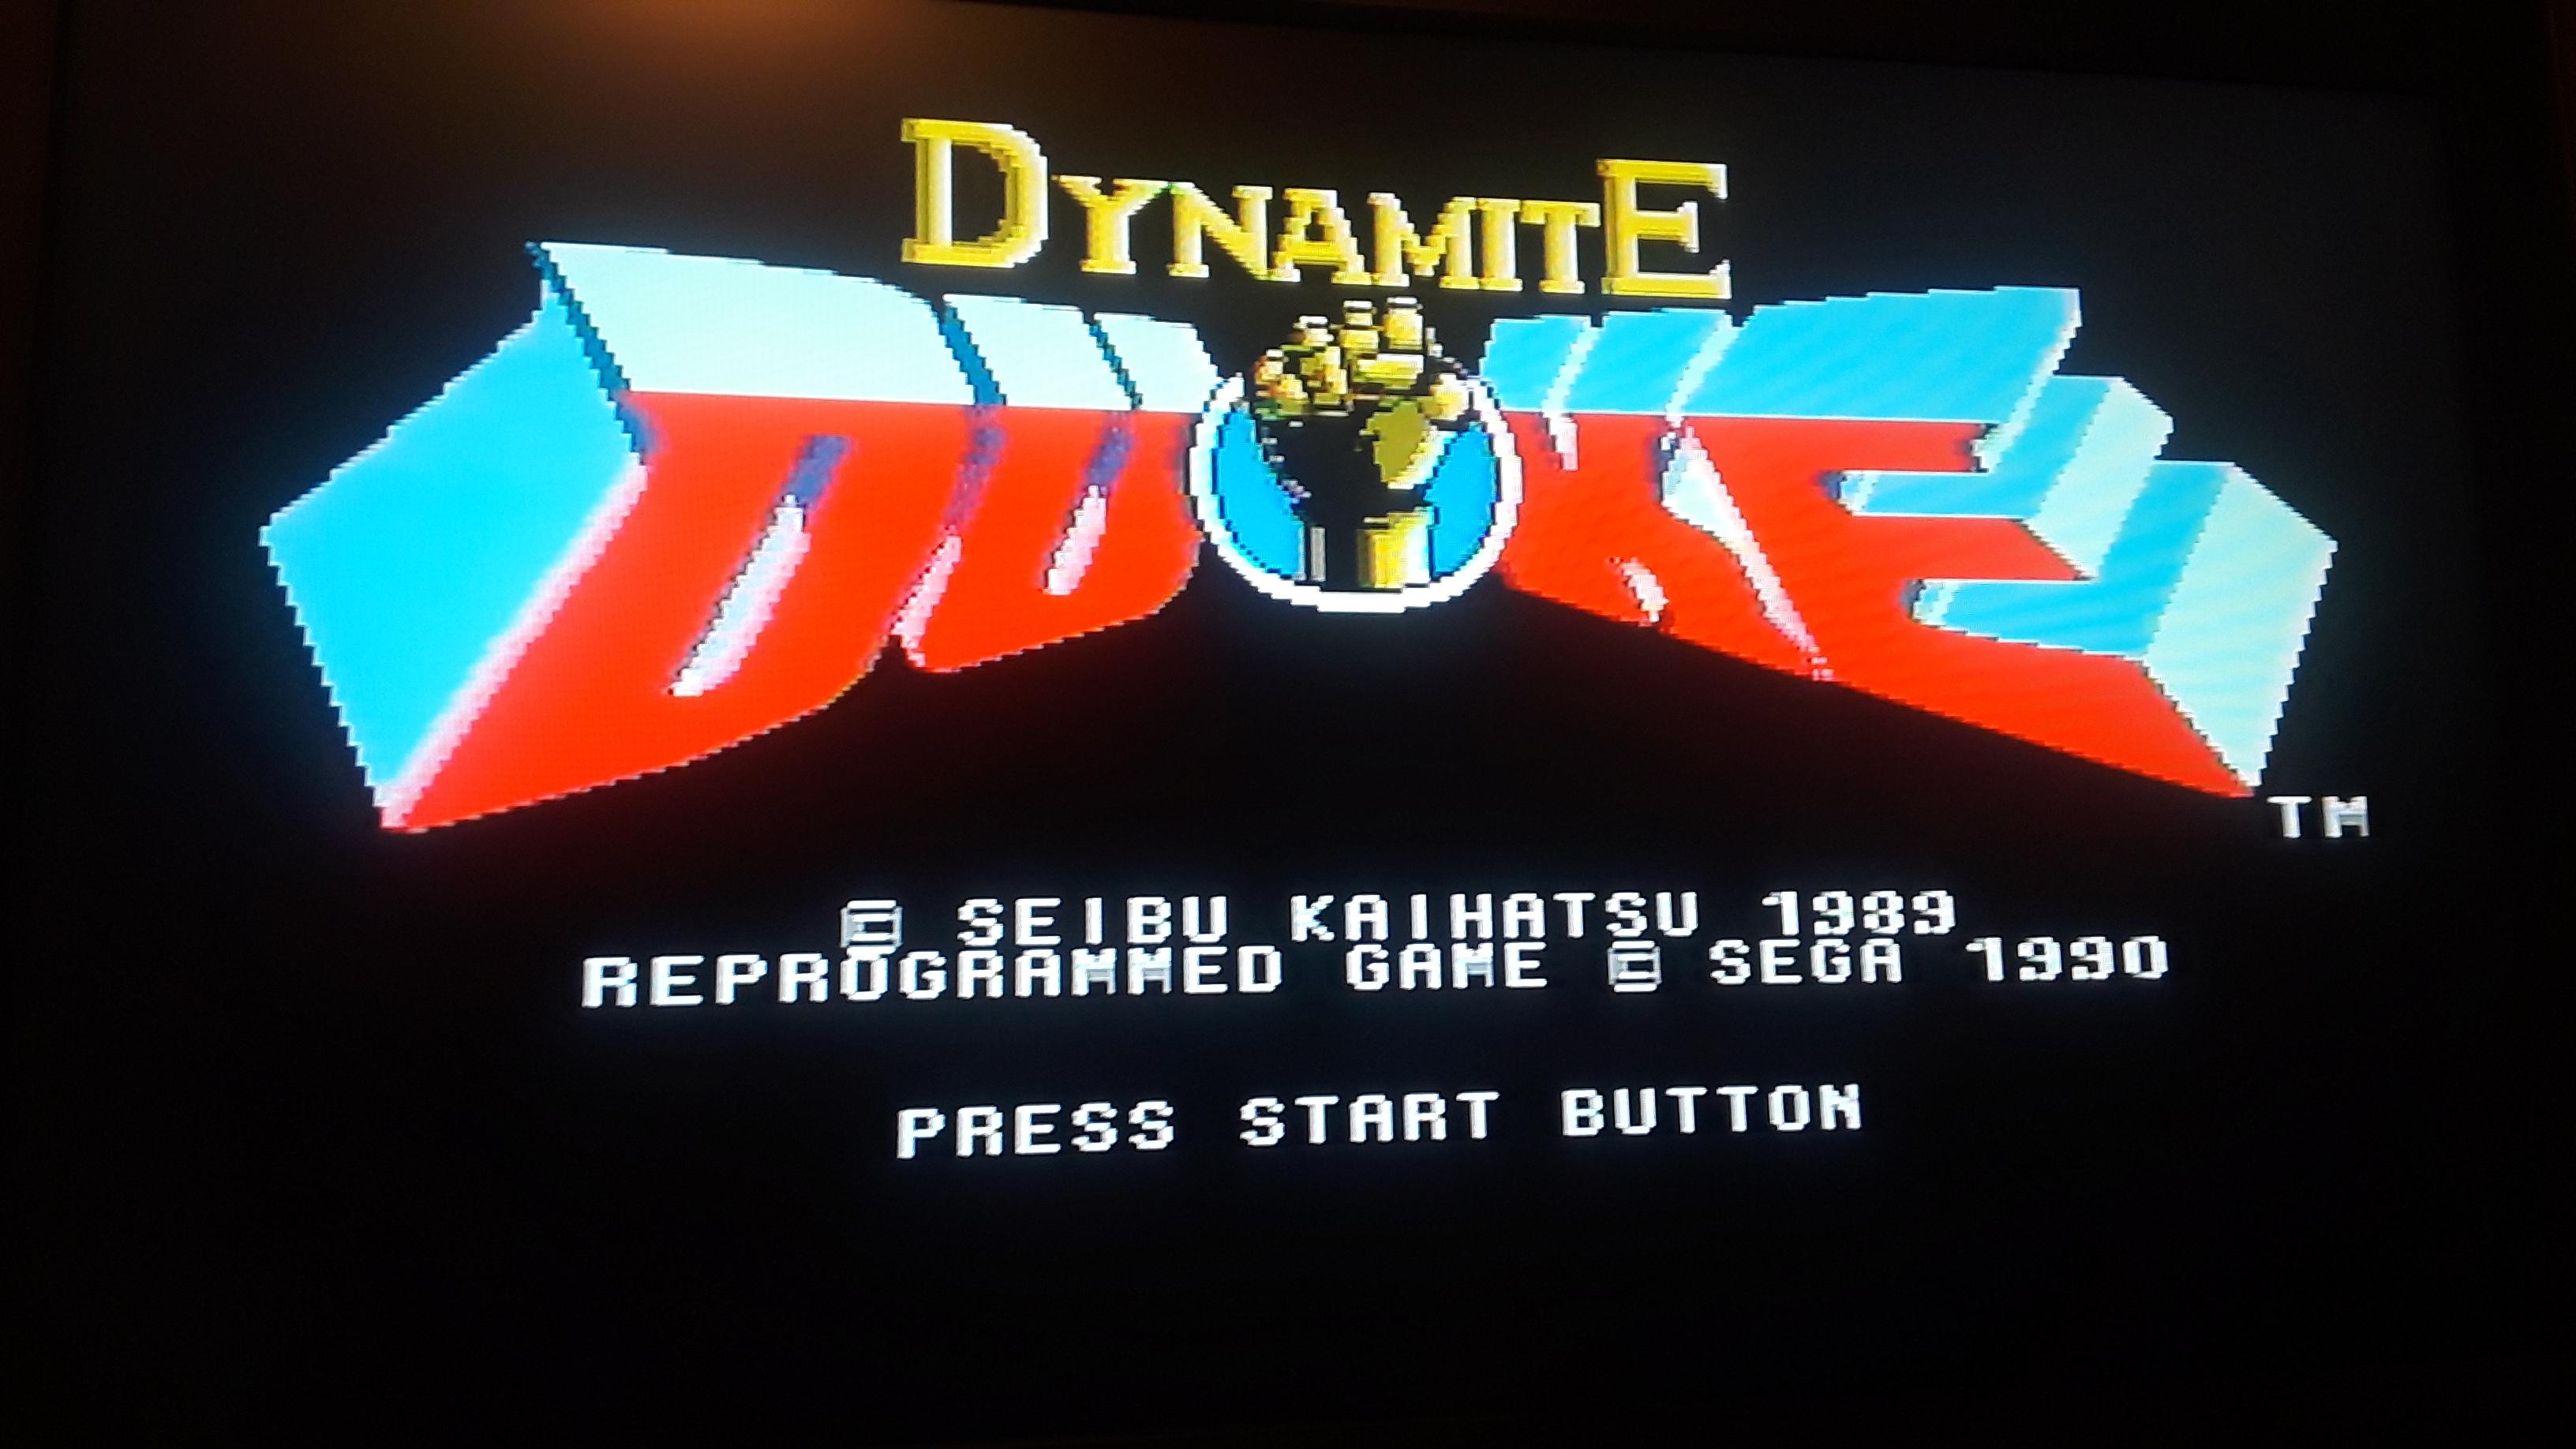 JML101582: Dynamite Duke (Sega Genesis / MegaDrive Emulated) 16,600 points on 2019-12-05 21:41:40